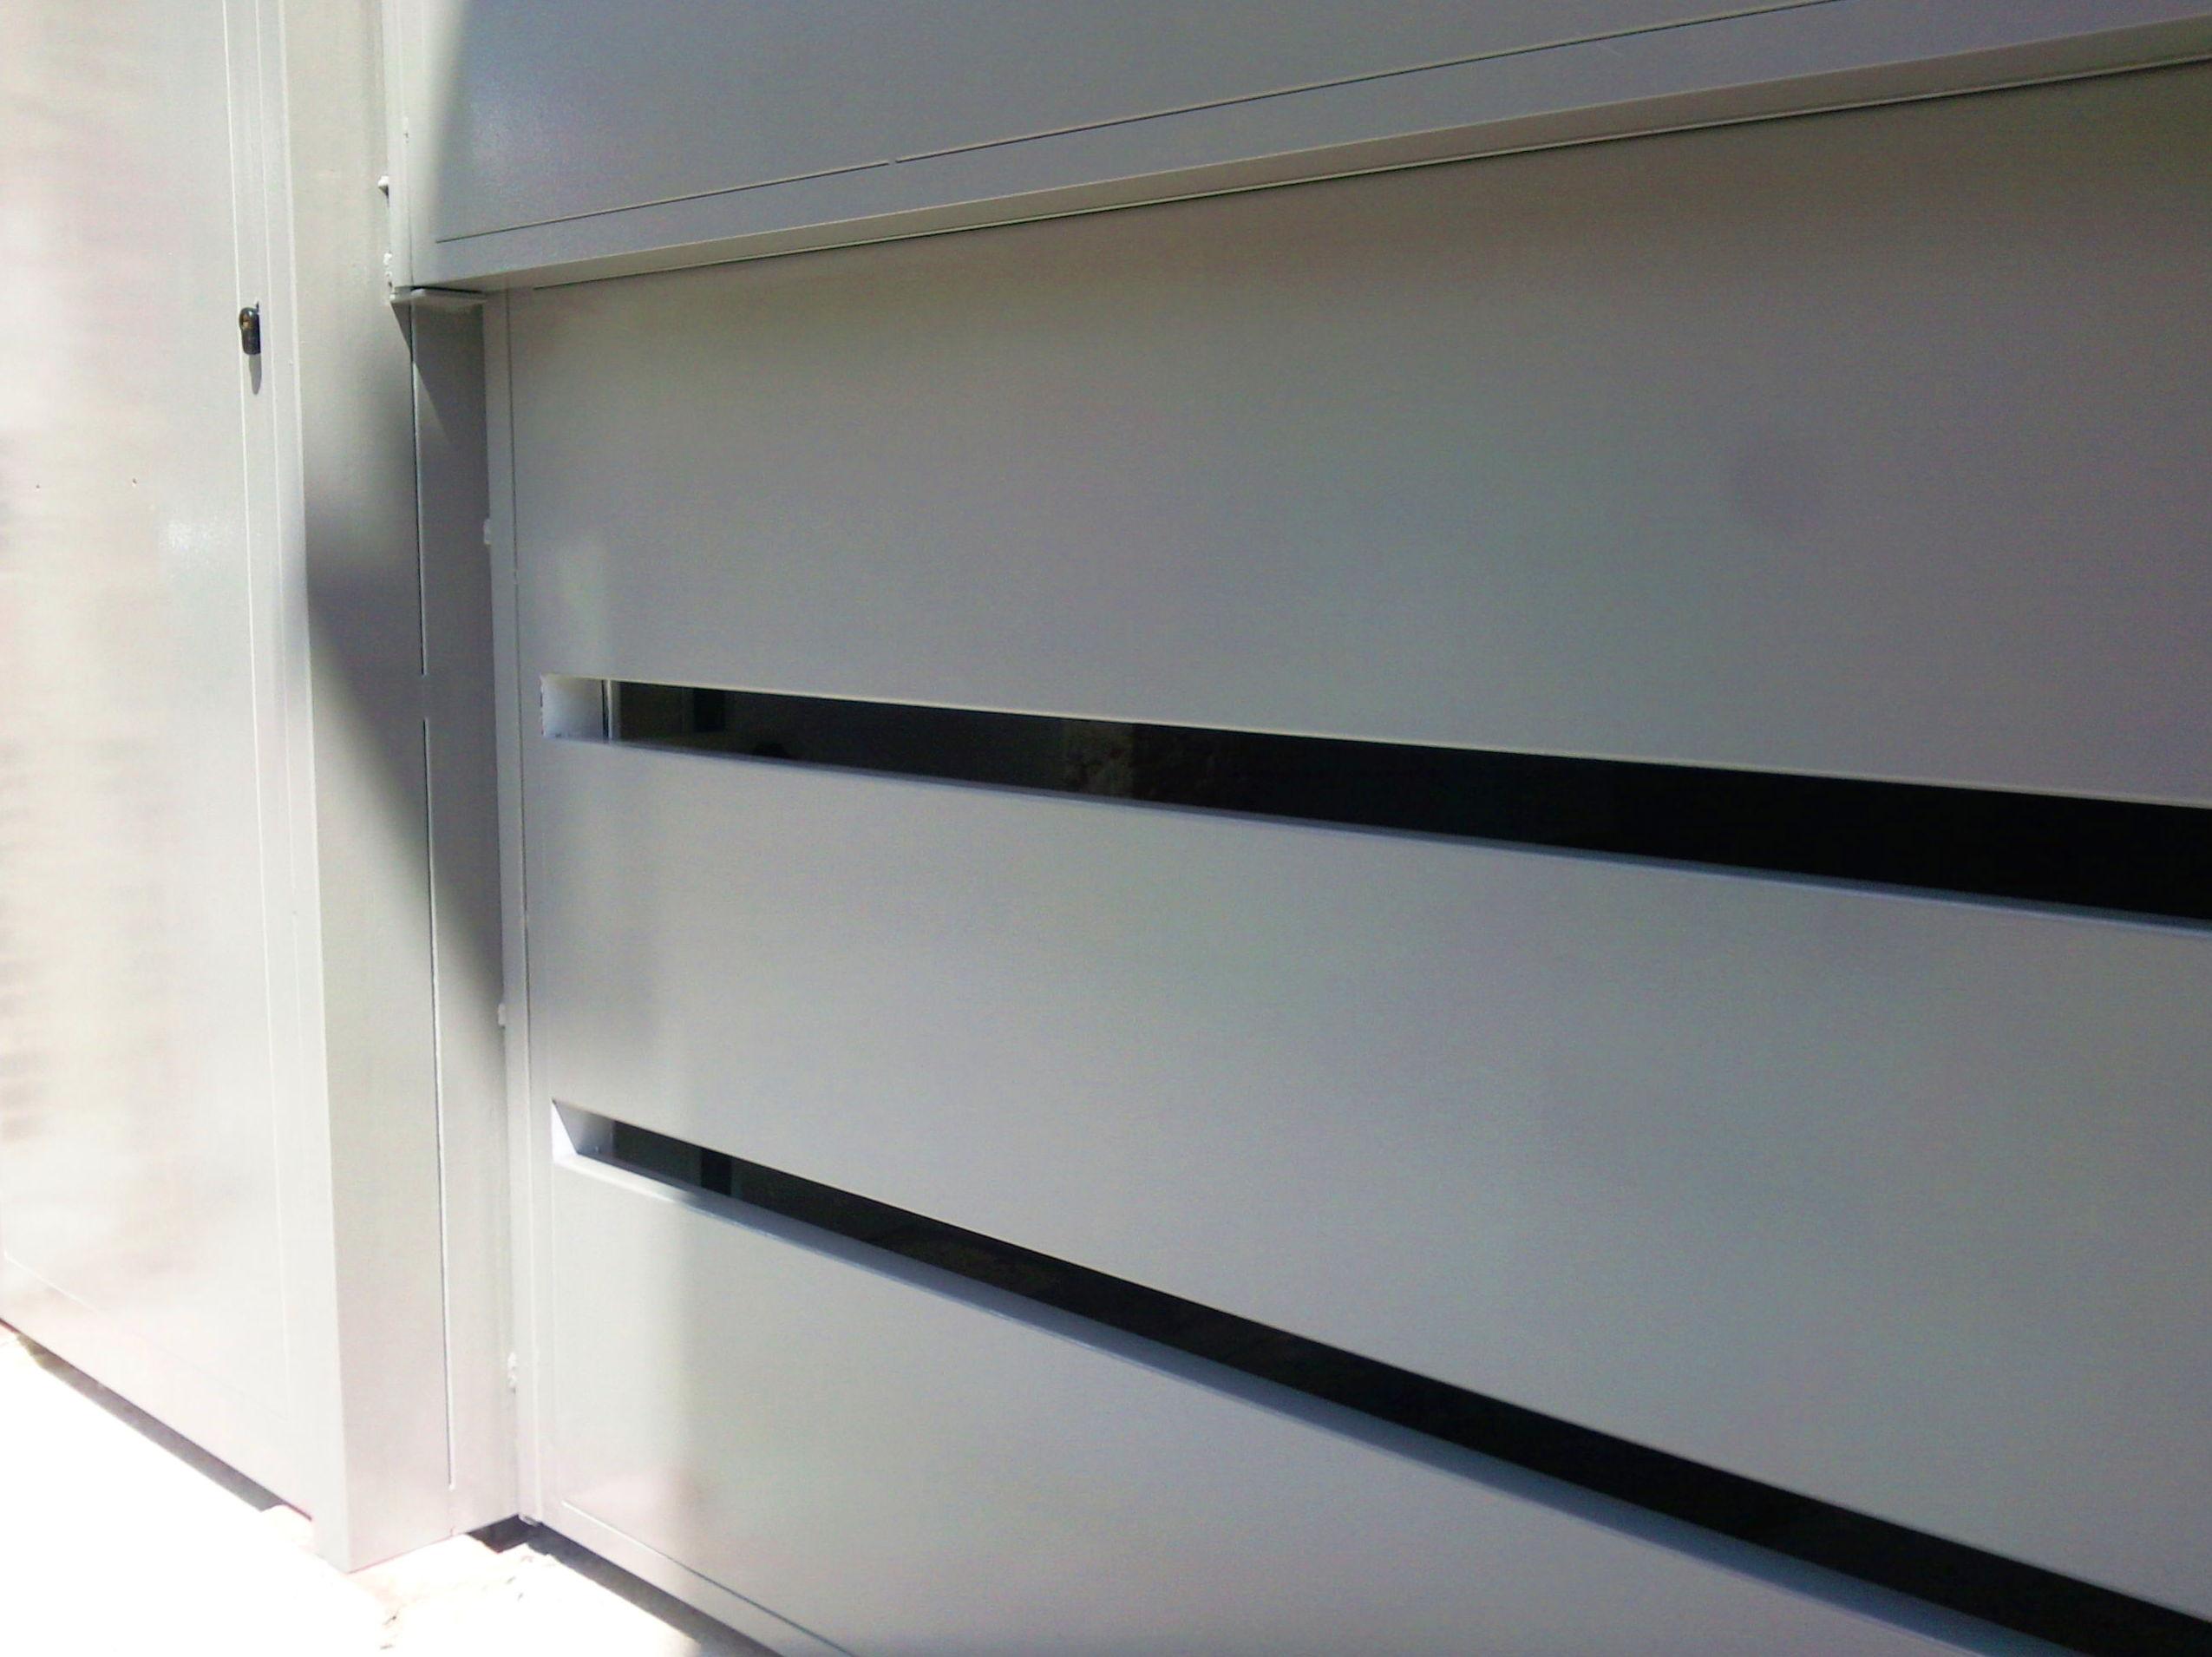 Puerta residencial guillotina 2 hojas Diseño en chapas lisas